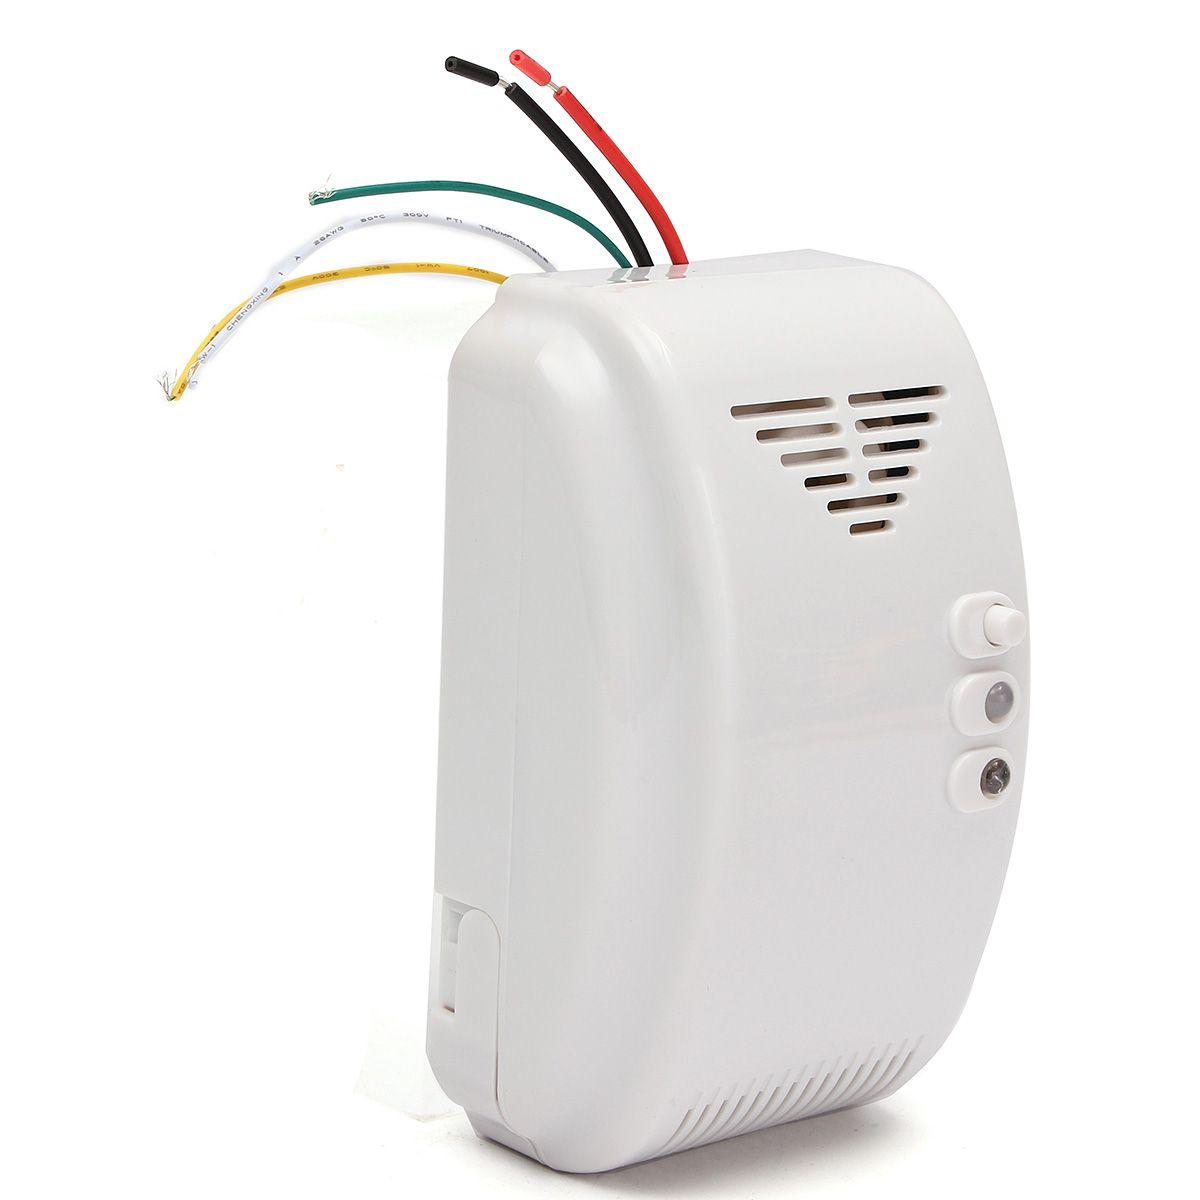 NEW 12V Gas Detector <font><b>Sensor</b></font> Alarm Propane Butane LPG Natural Motorhome For Home Alarm System Security